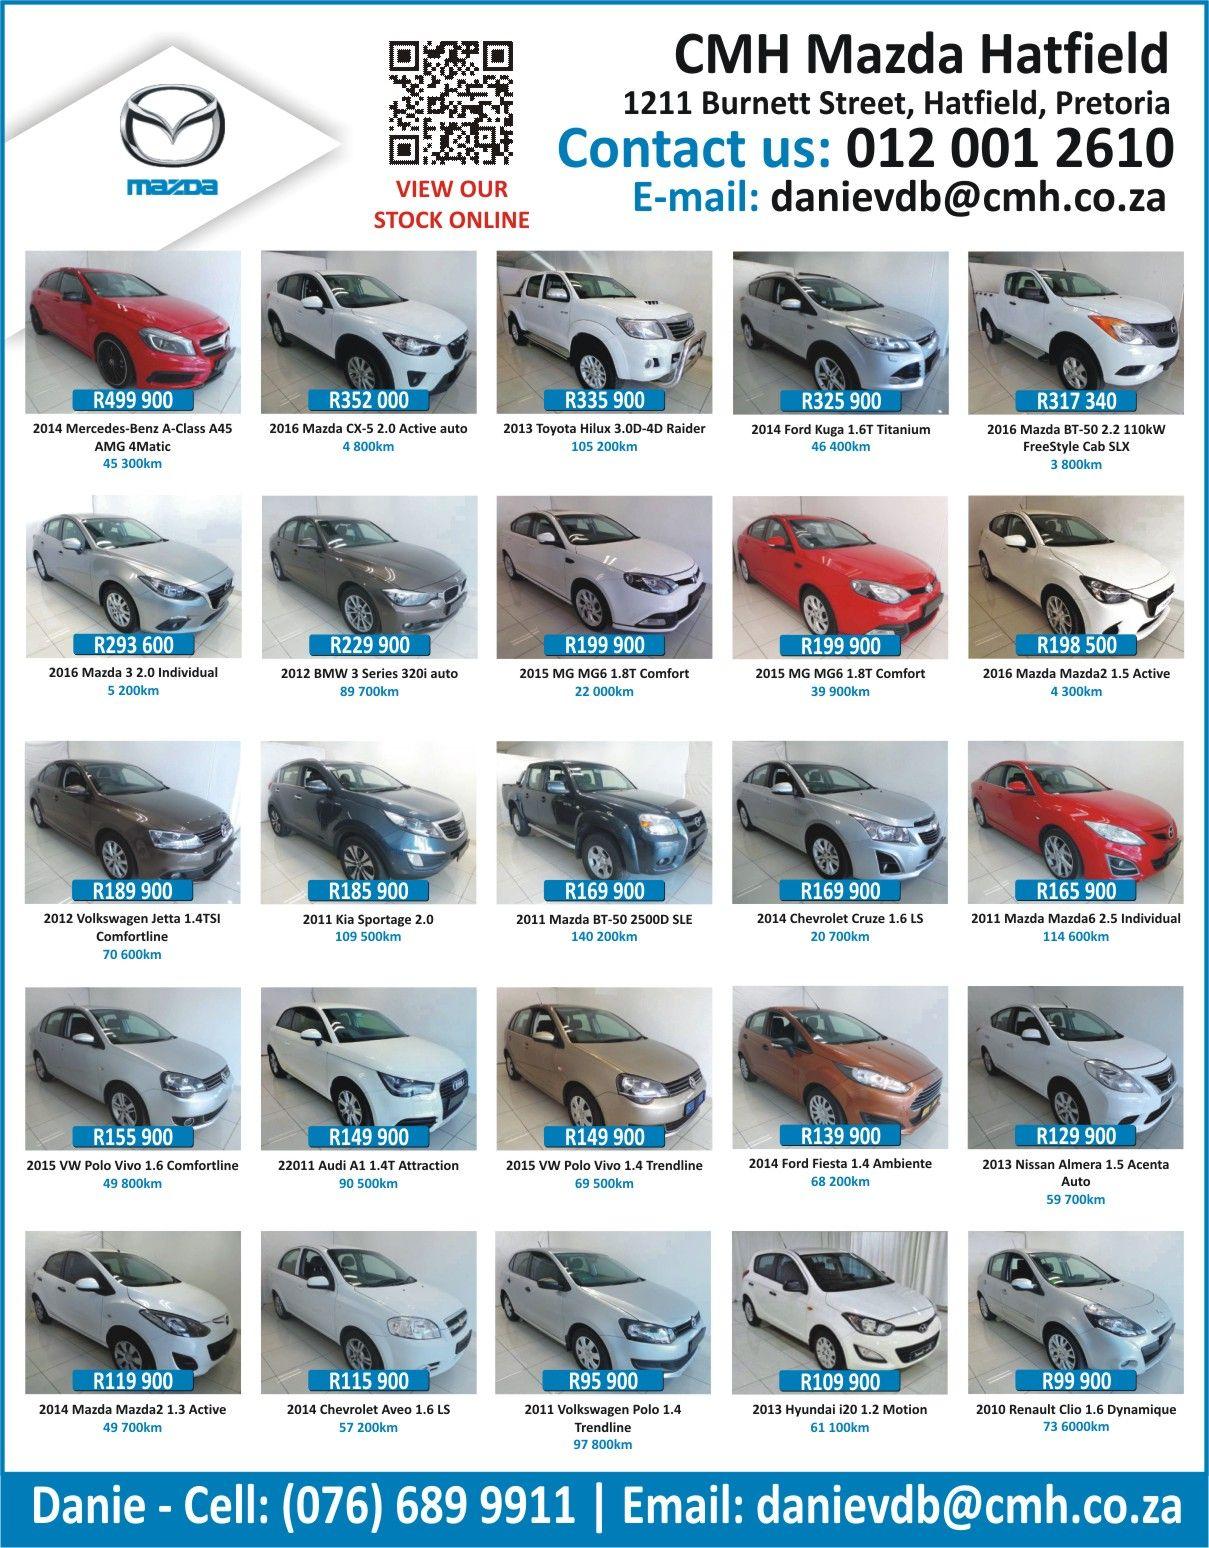 Cmh Mazda Hatfield Contact Us 012 001 2610 Email Danievdb Cmh Co Za Danie Cell 076 689 9911 Http Www Autofind Co Za Mazda Hatfi Hatfield Bmw Series Mazda